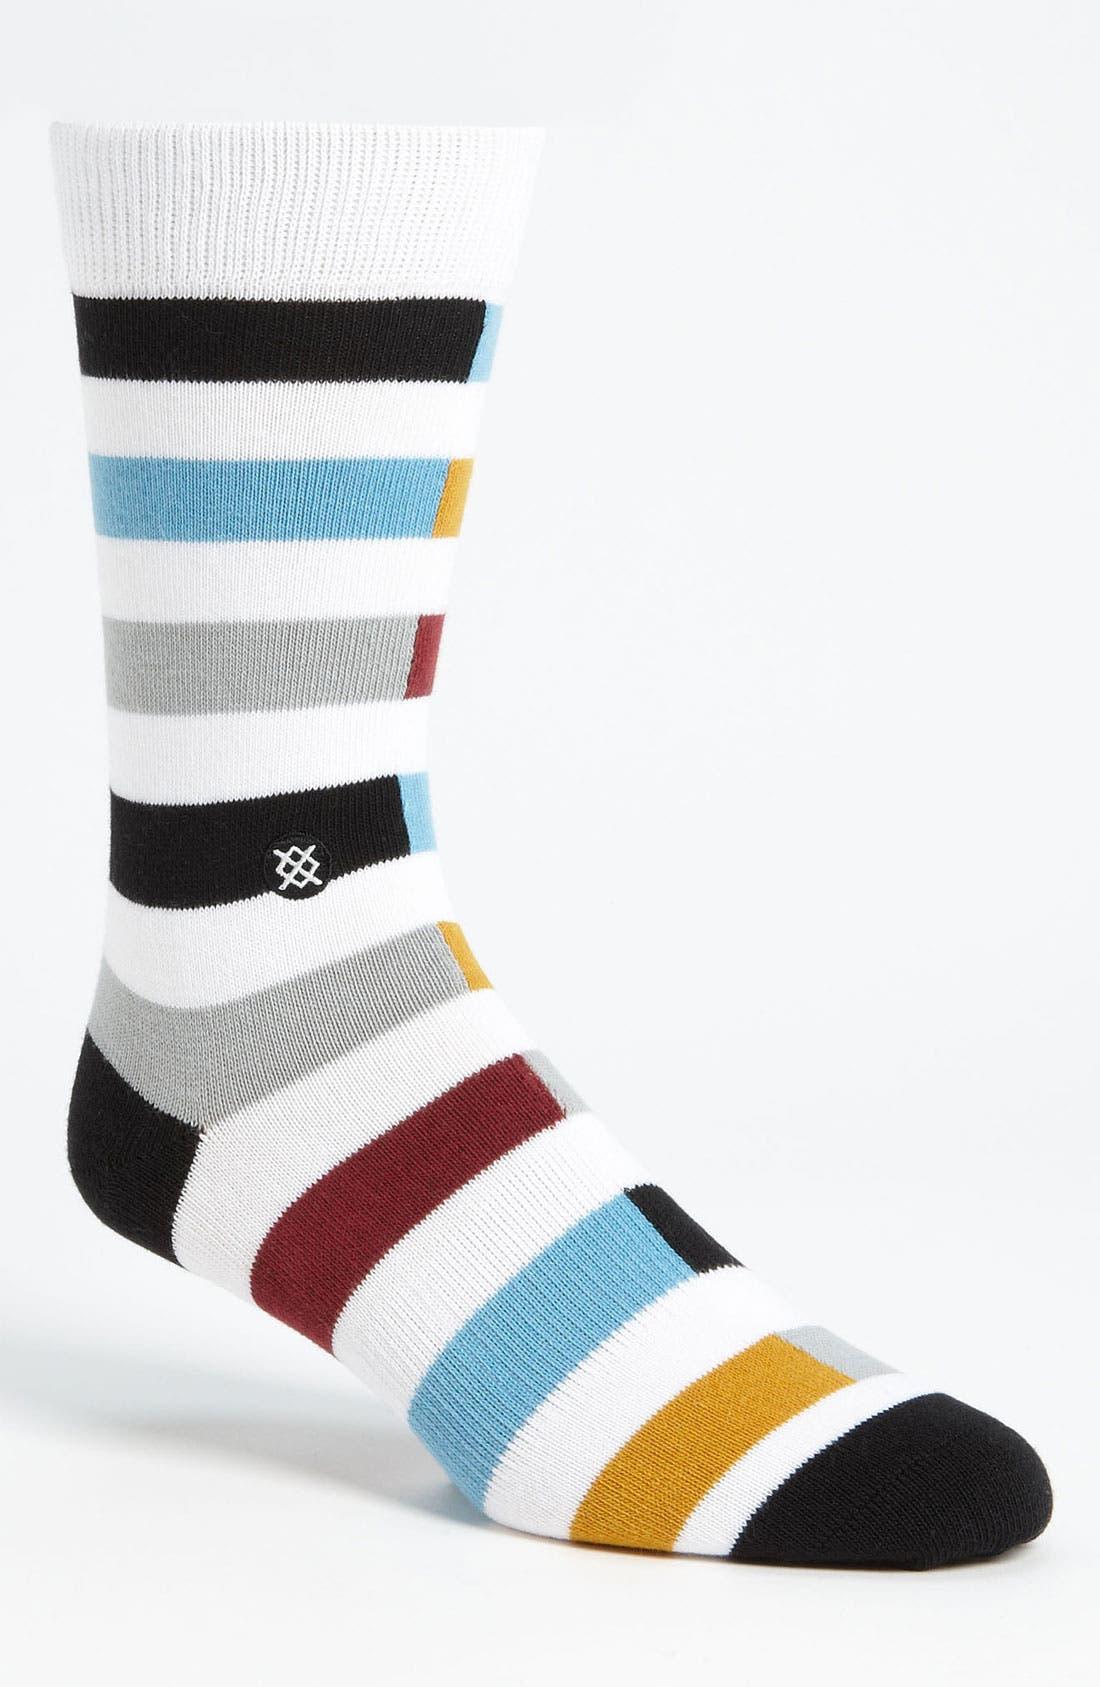 Main Image - Stance 'Cooper' Socks